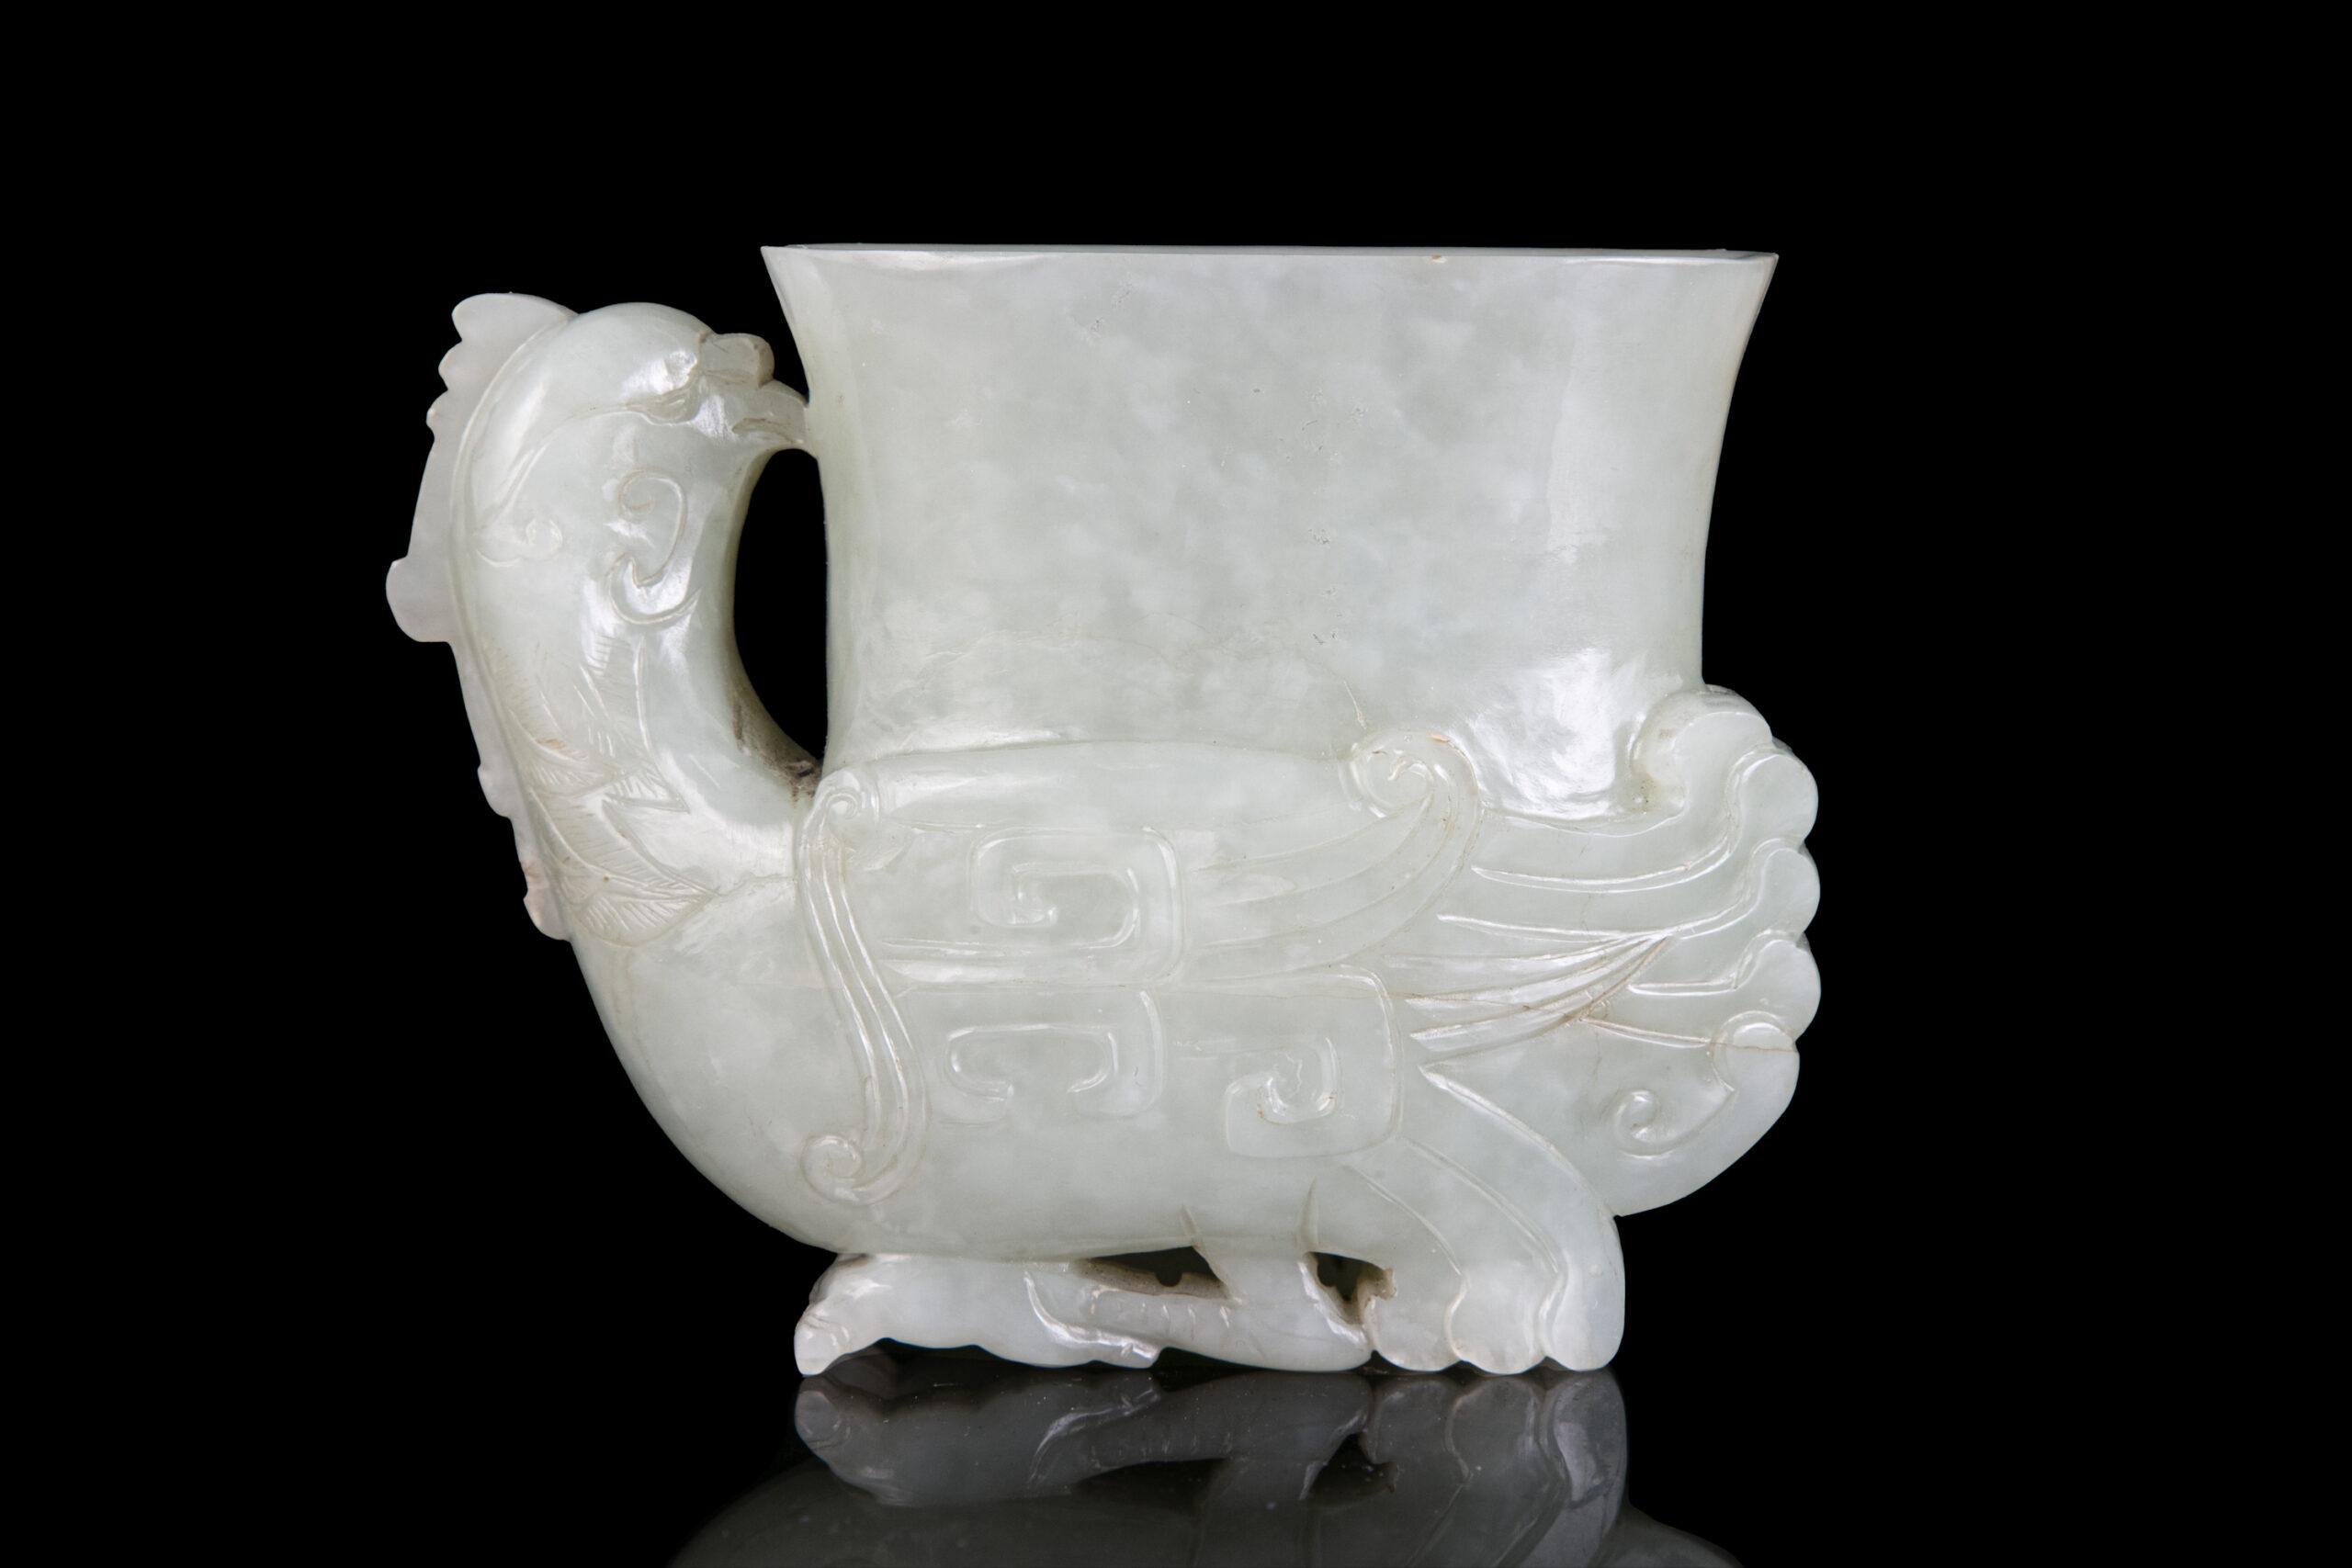 A JADE PHOENIX ARCHAISTIC VESSEL, RHYTON OR GONG, CHINA, QING DYNASTY, 19TH CENTURY